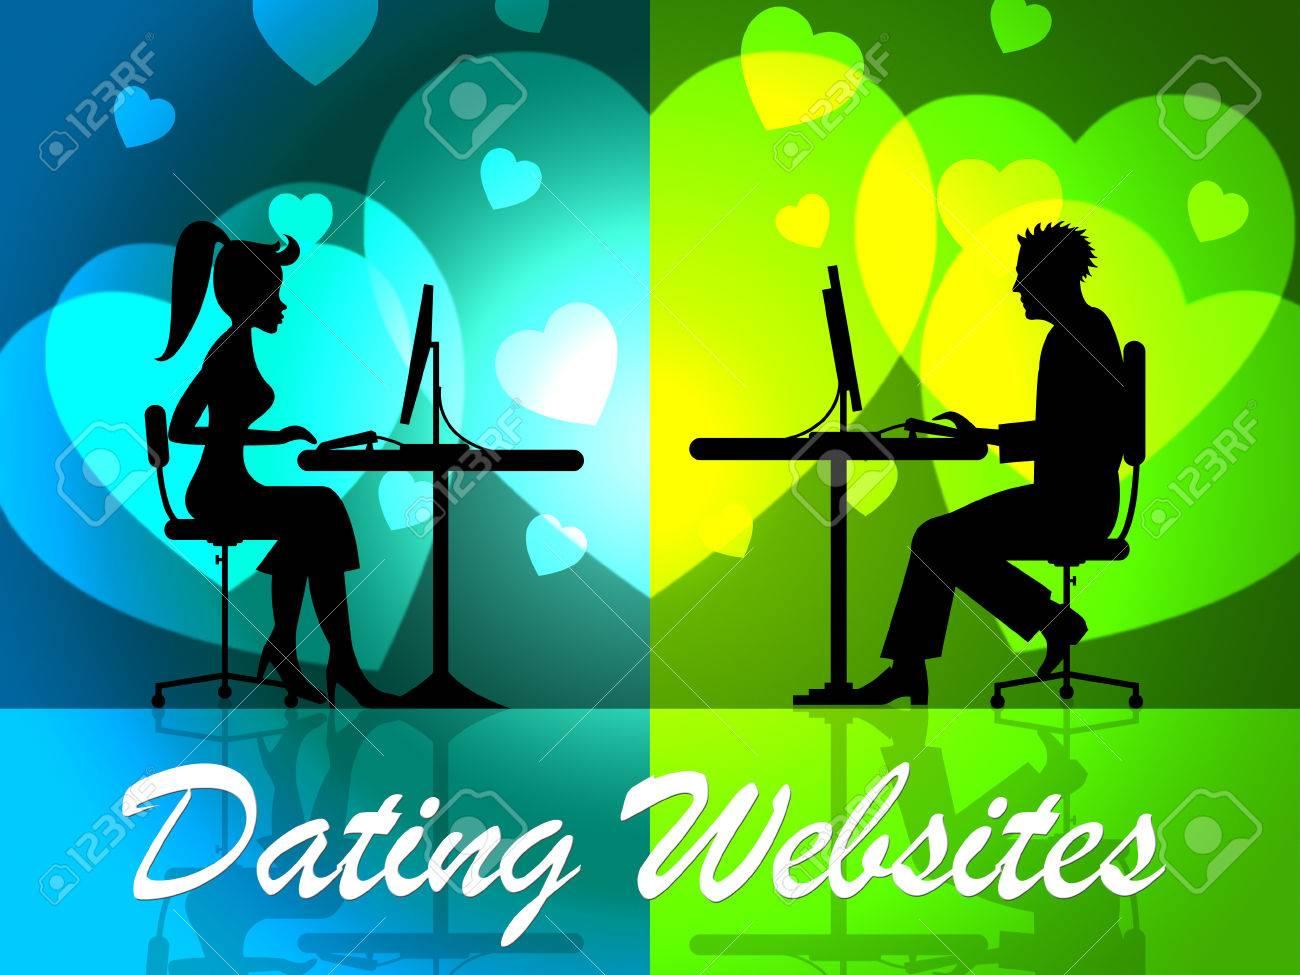 dating websites for dates